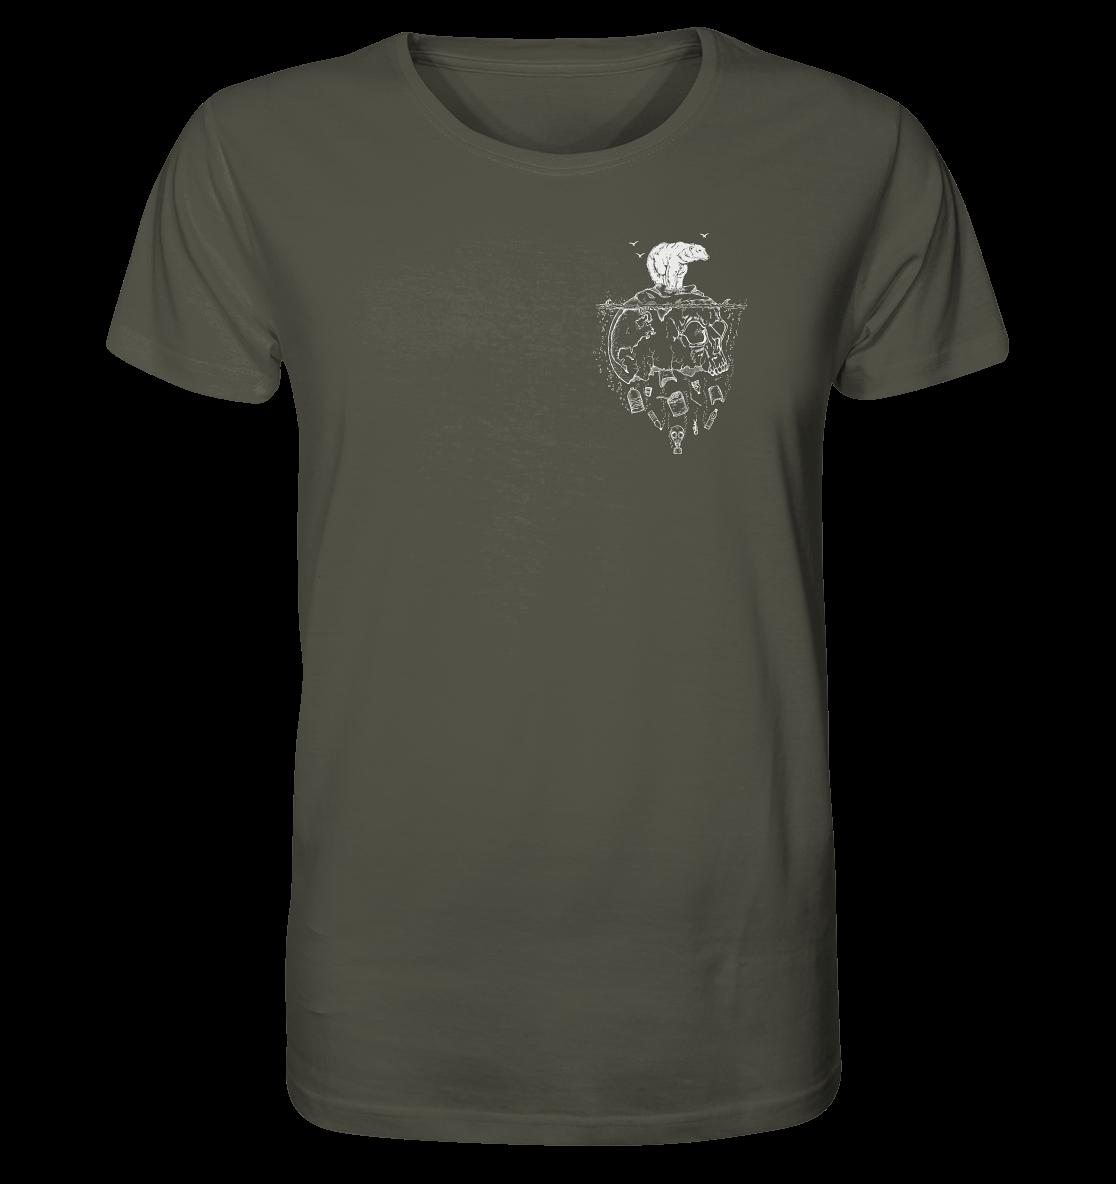 front-organic-shirt-545348-1116x-16.png